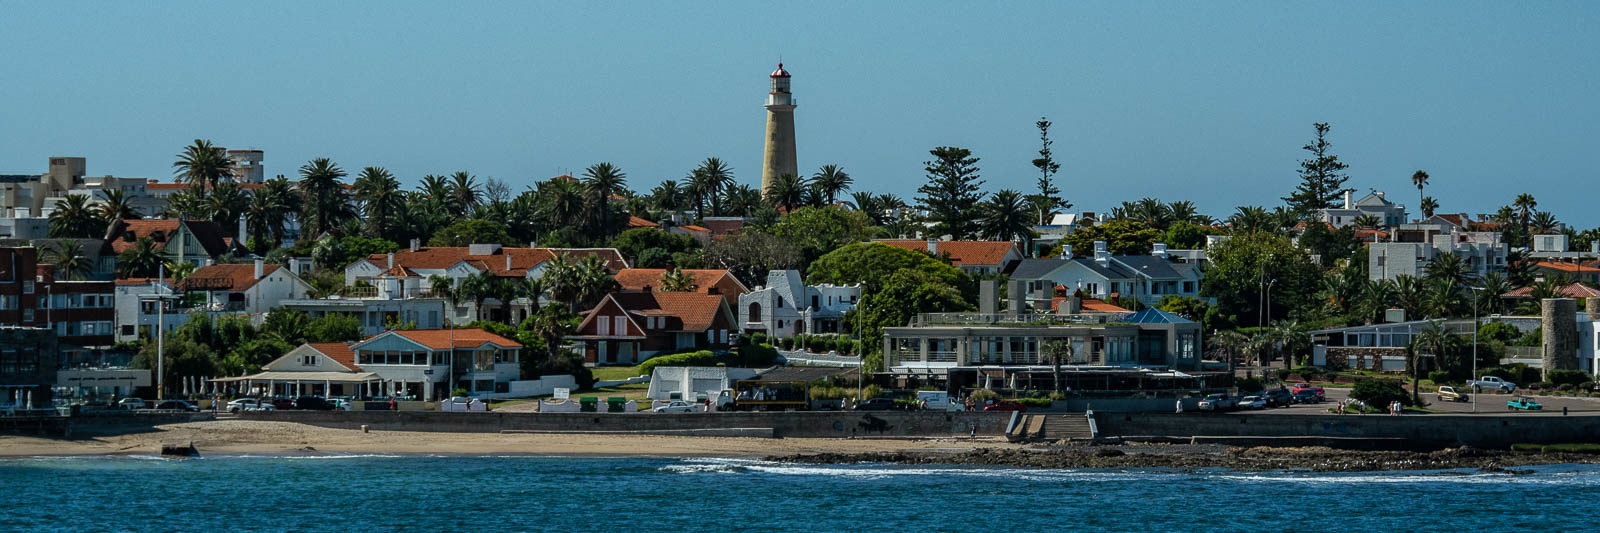 Visit Uruguay - Arrival at port in Punta del Este